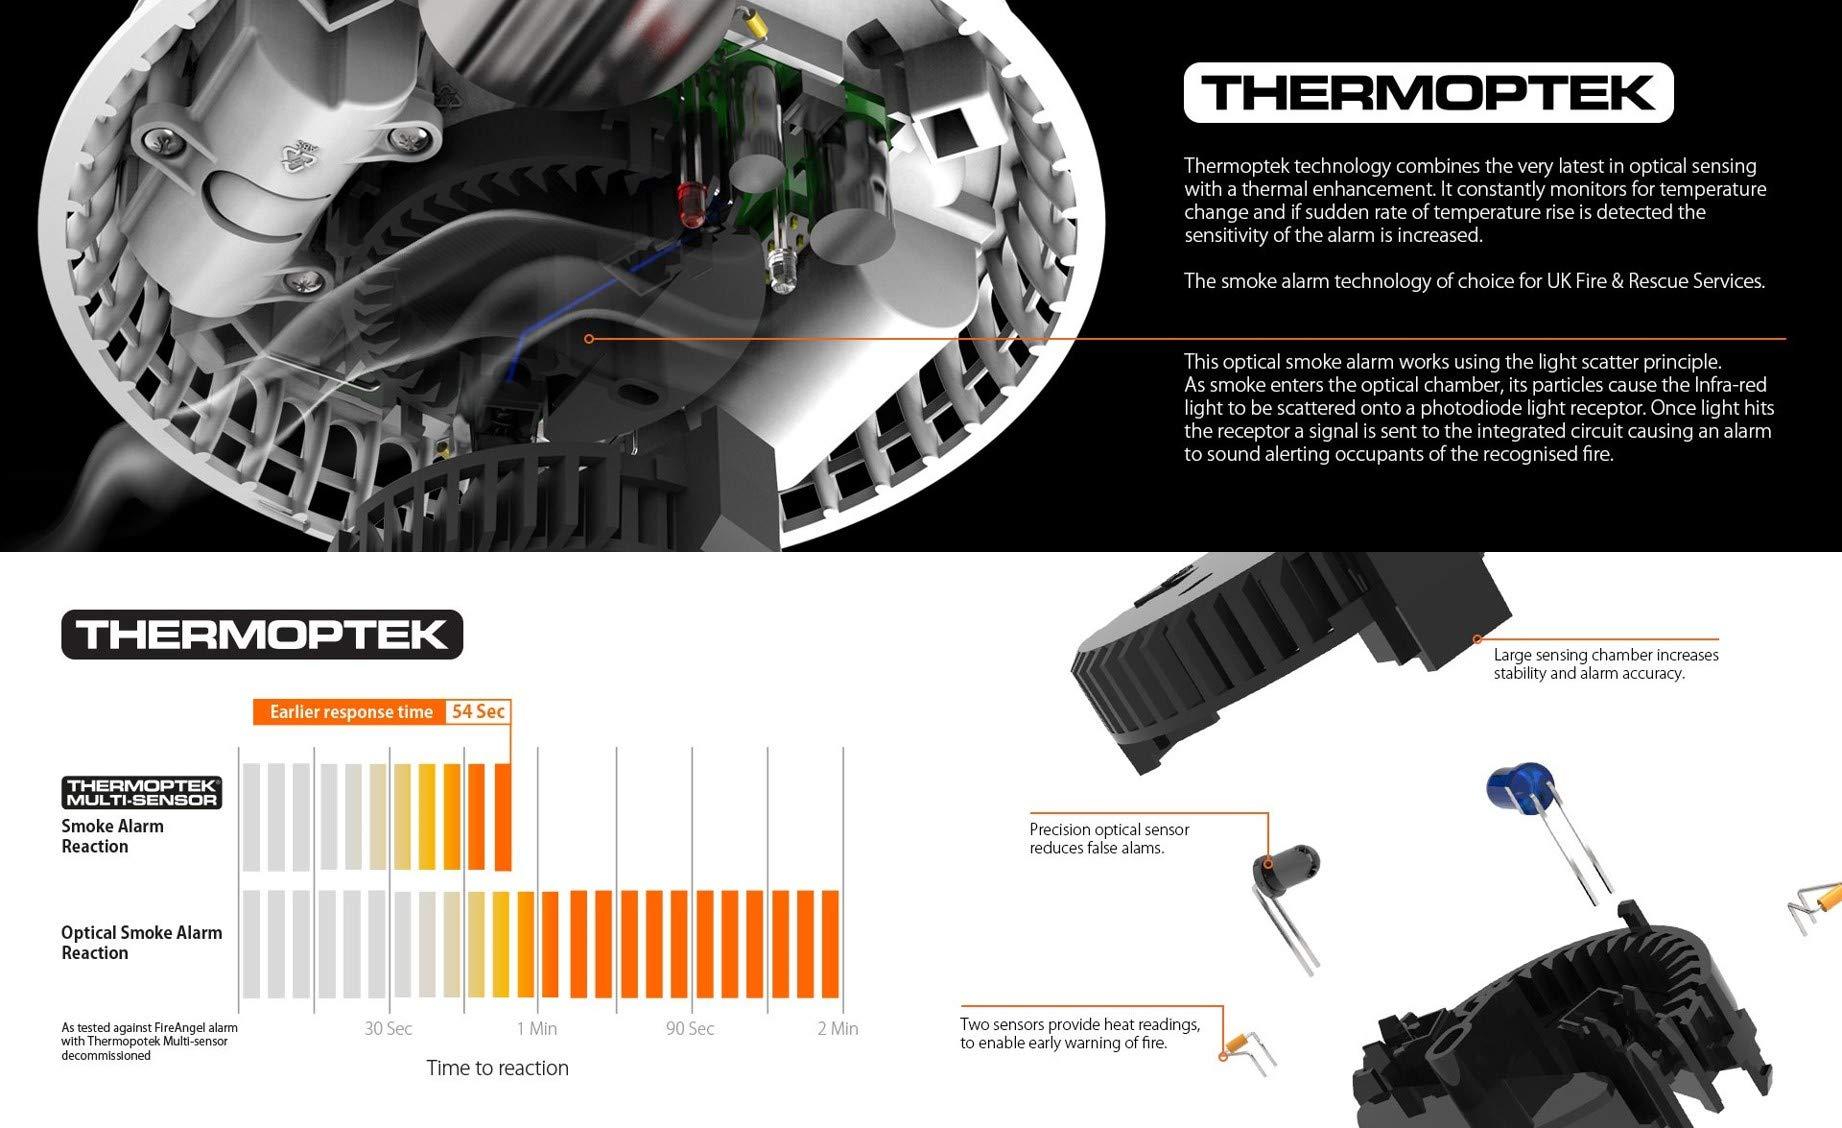 Thermoptek Toast Proof Smoke Alarm - FireAngel ST-625 8